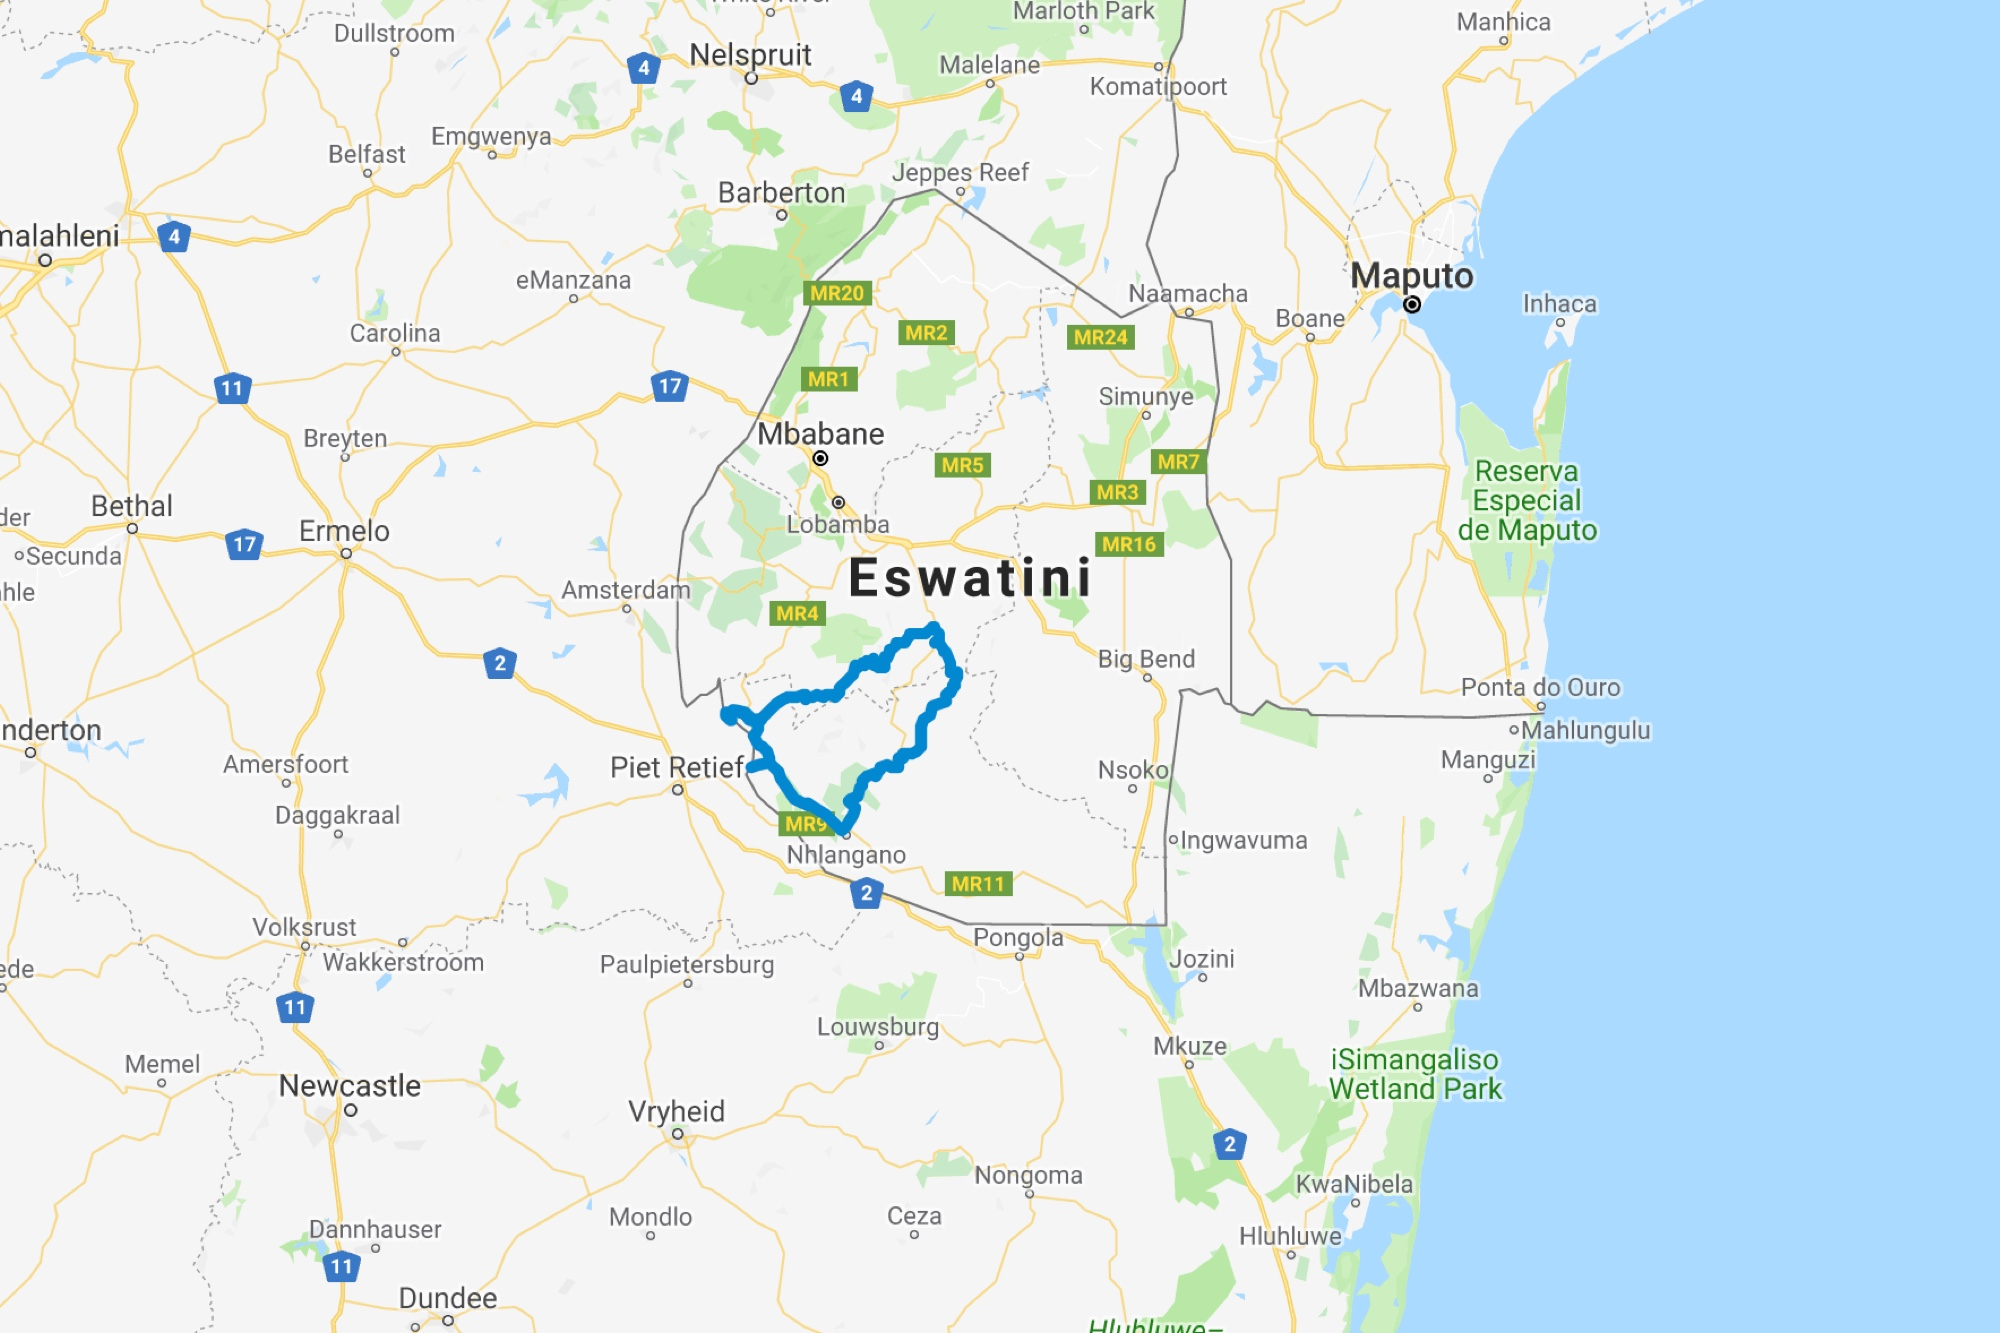 swaziland-map.jpg